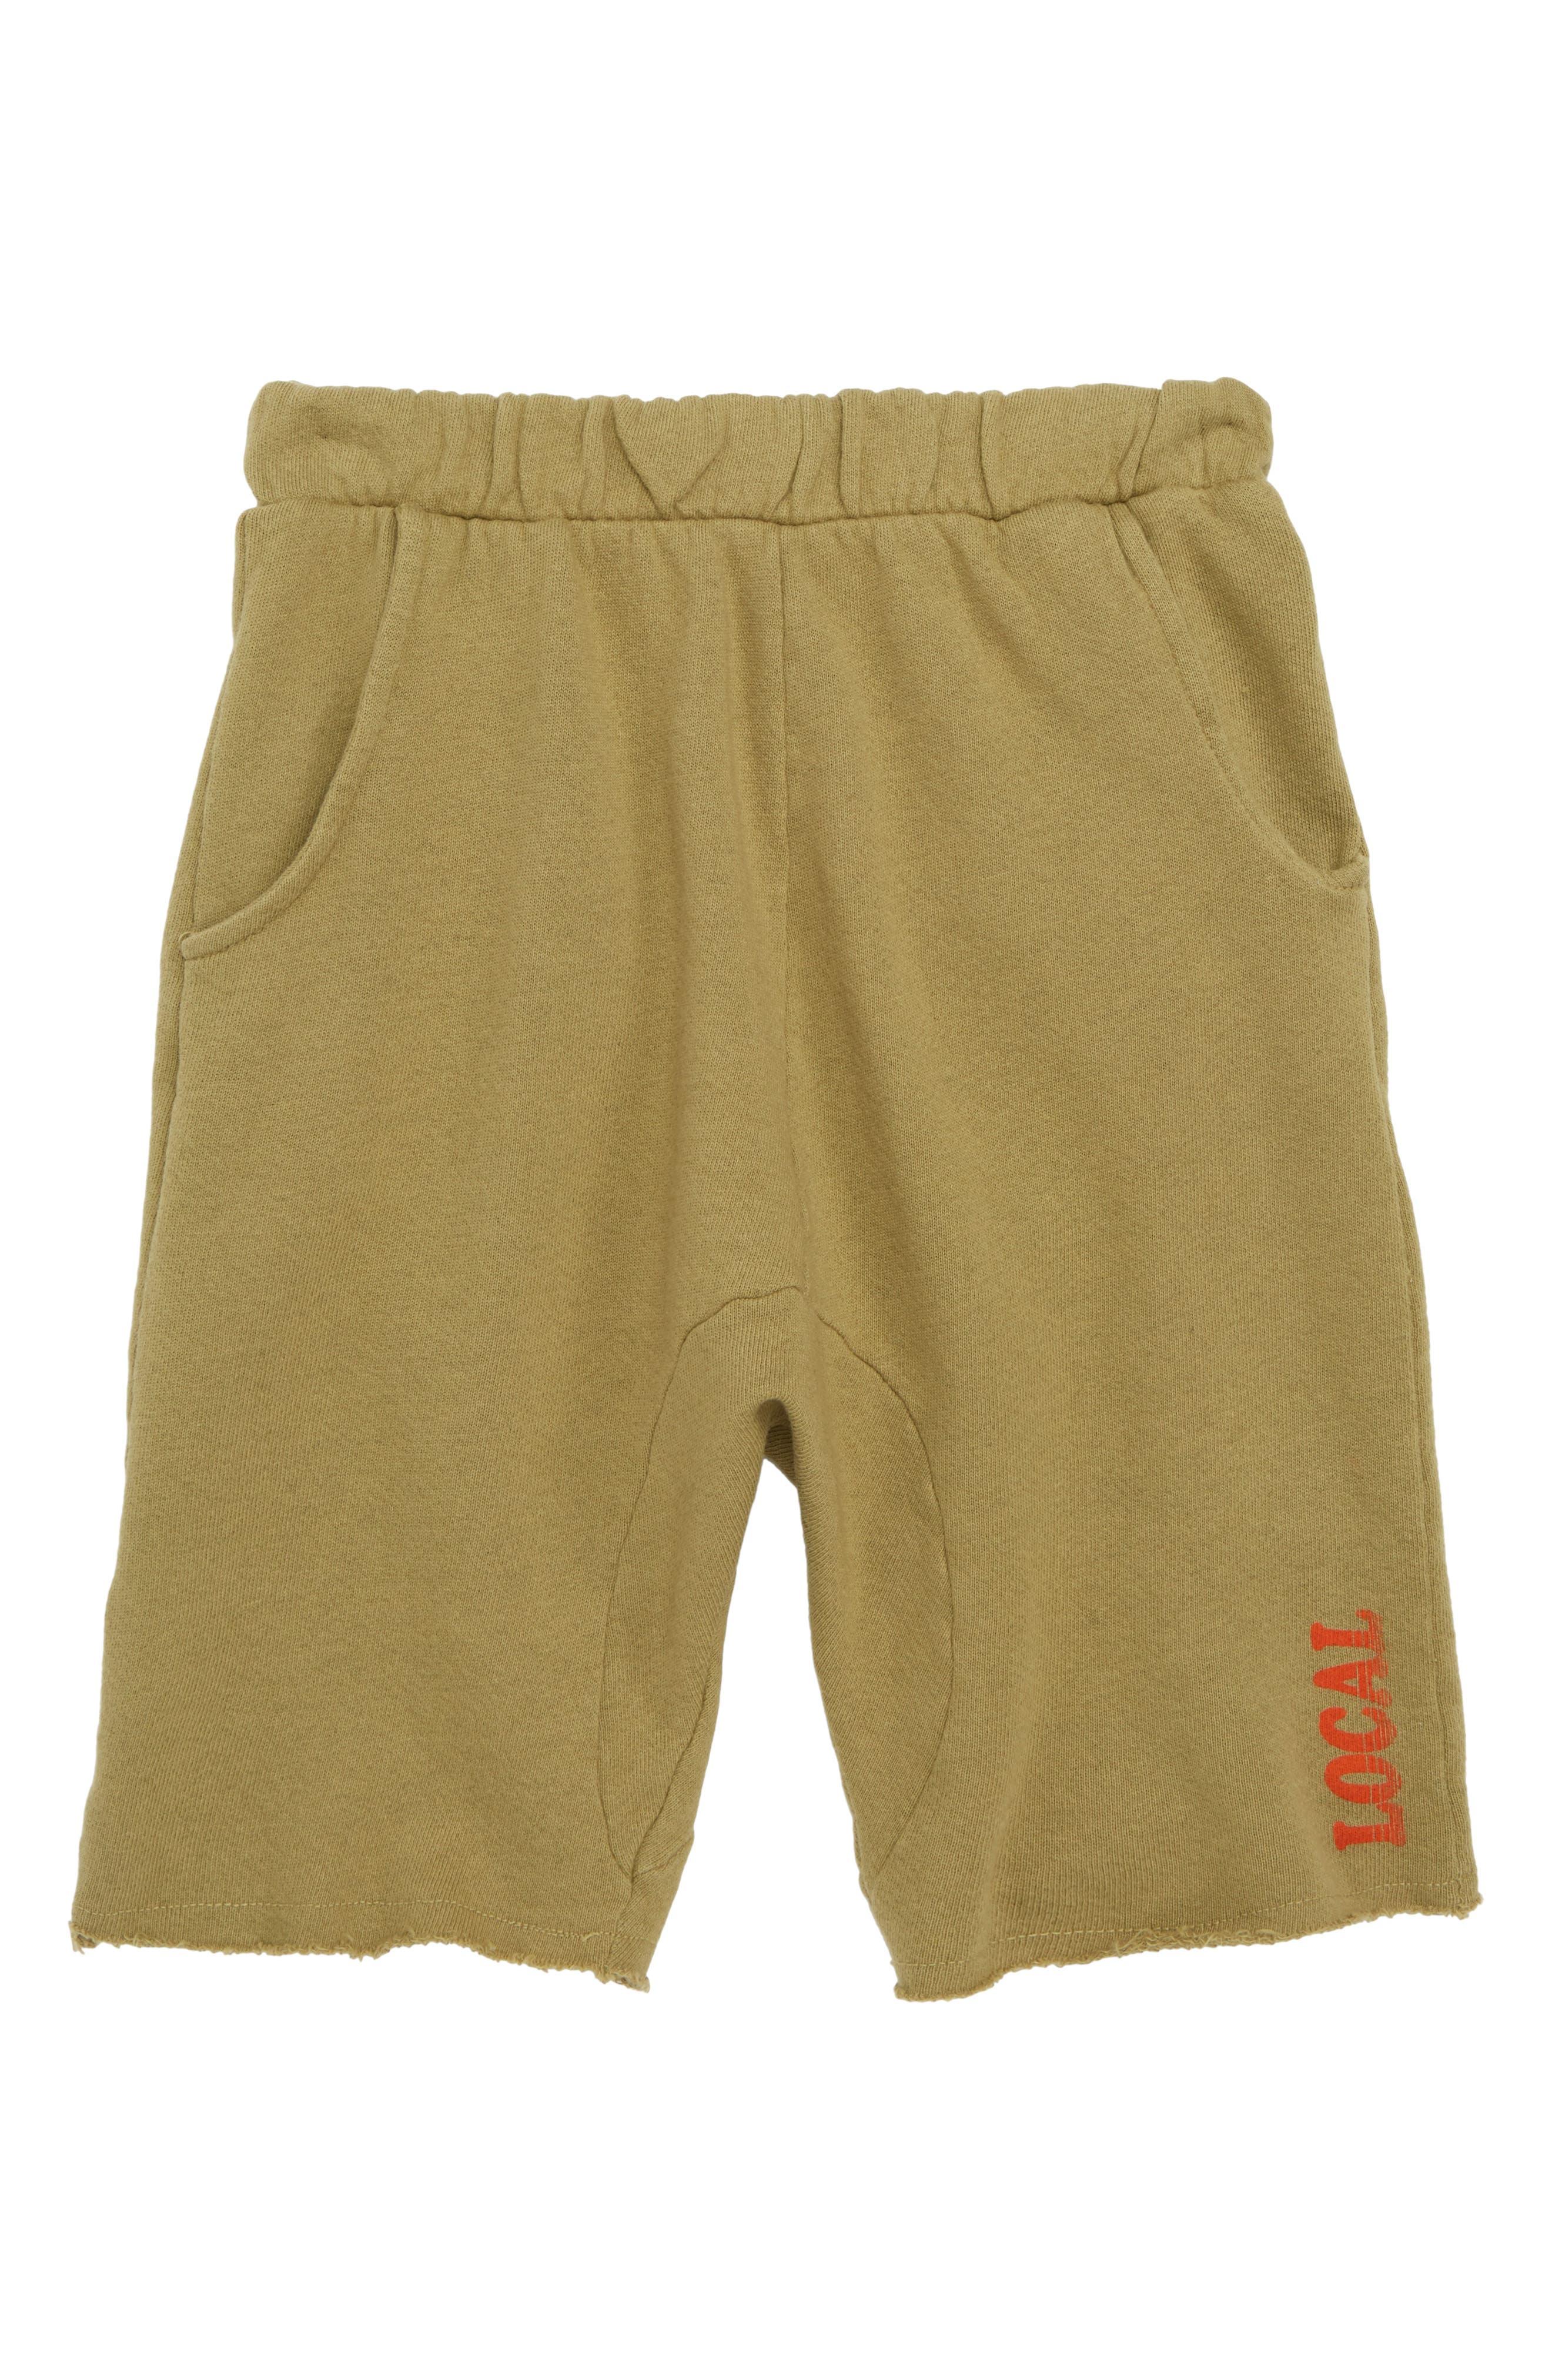 Cozy Time Shorts,                             Main thumbnail 3, color,